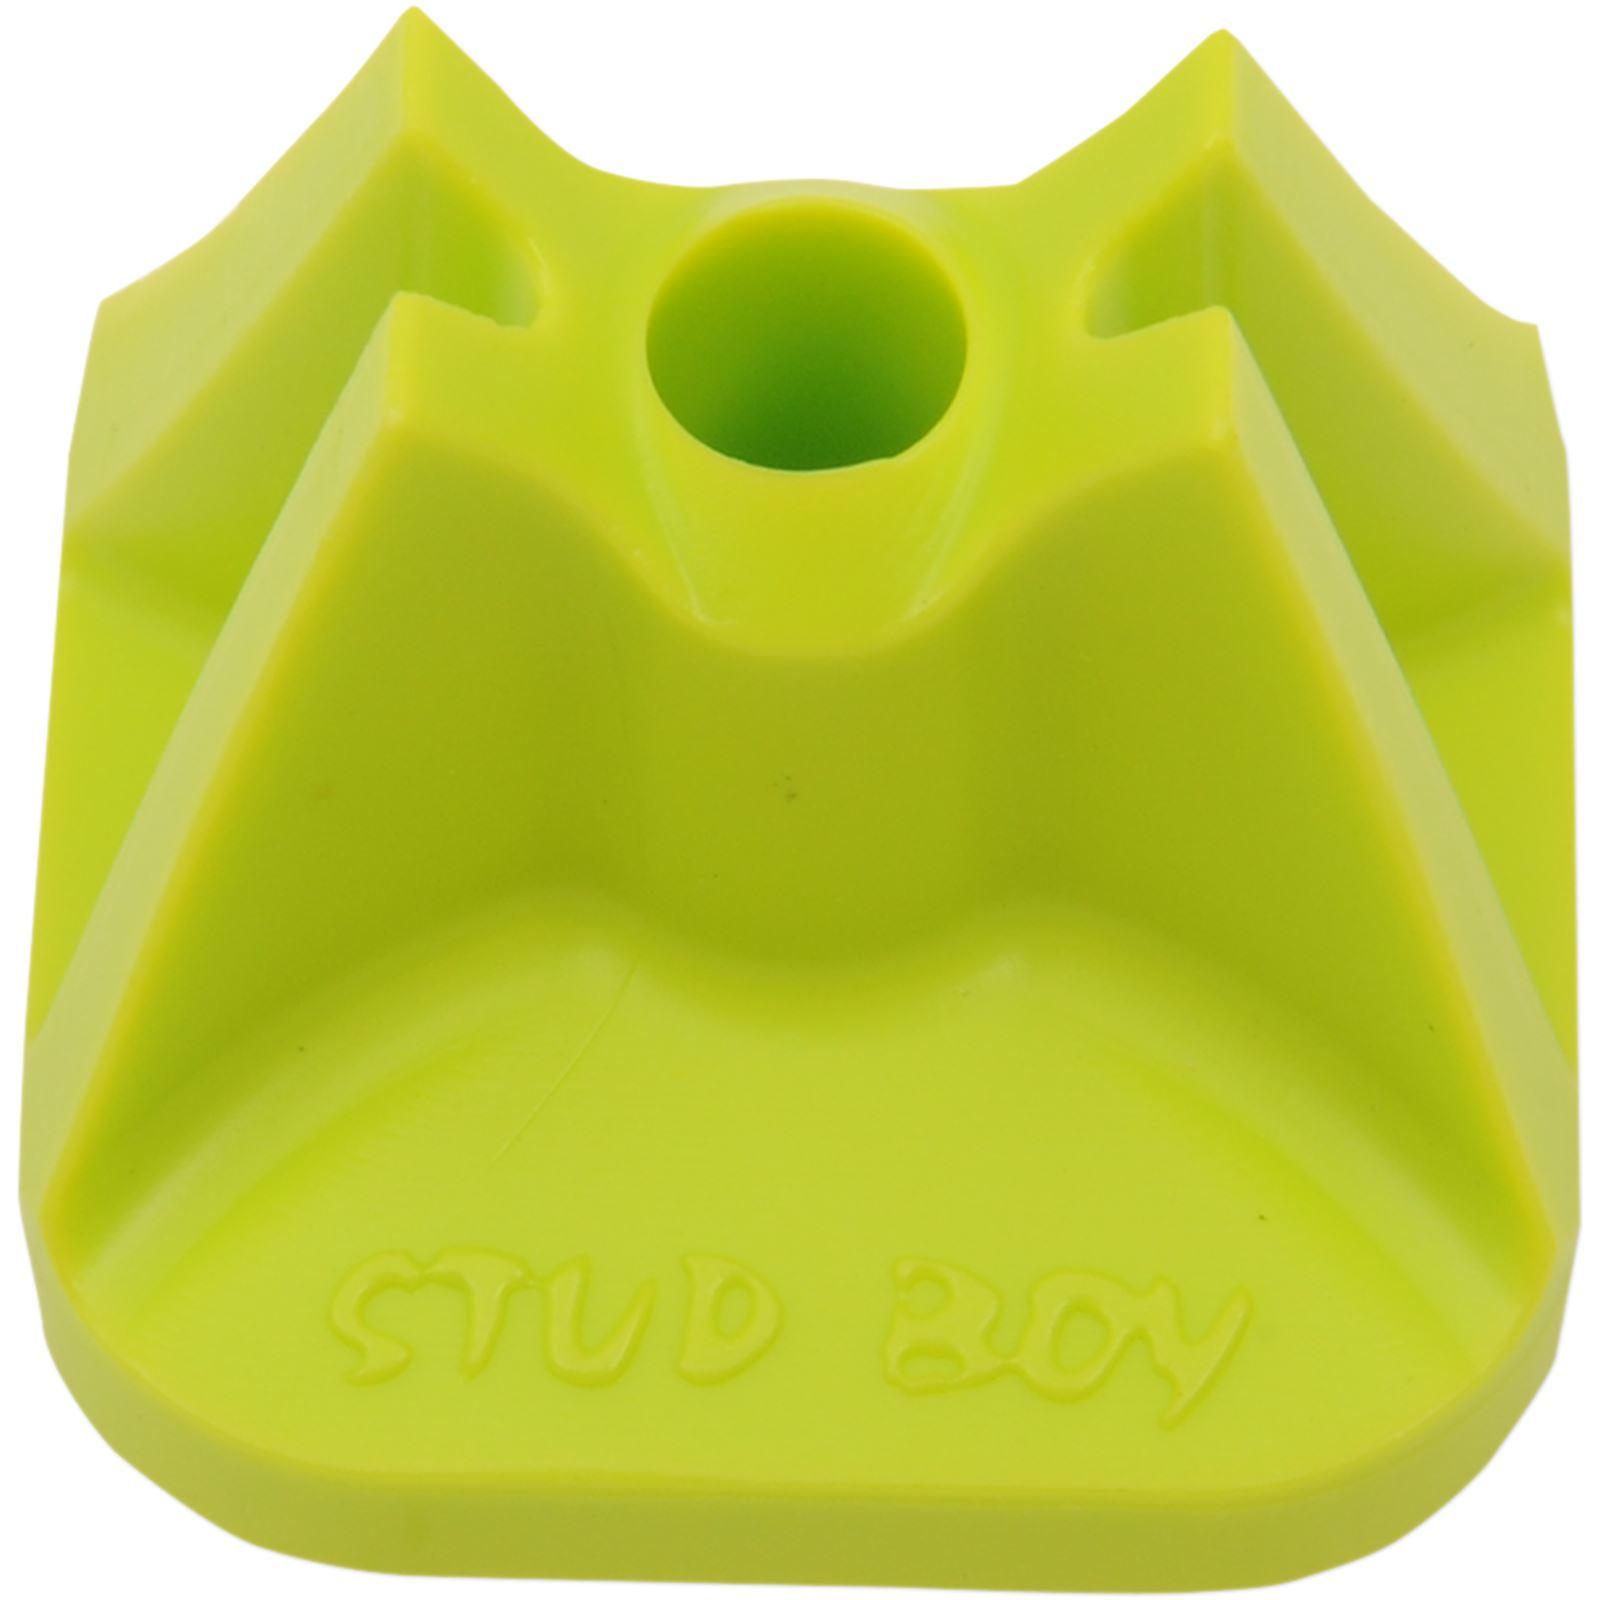 Stud Boy Single Backer Plates - Hi-viz Green - 24/Pack